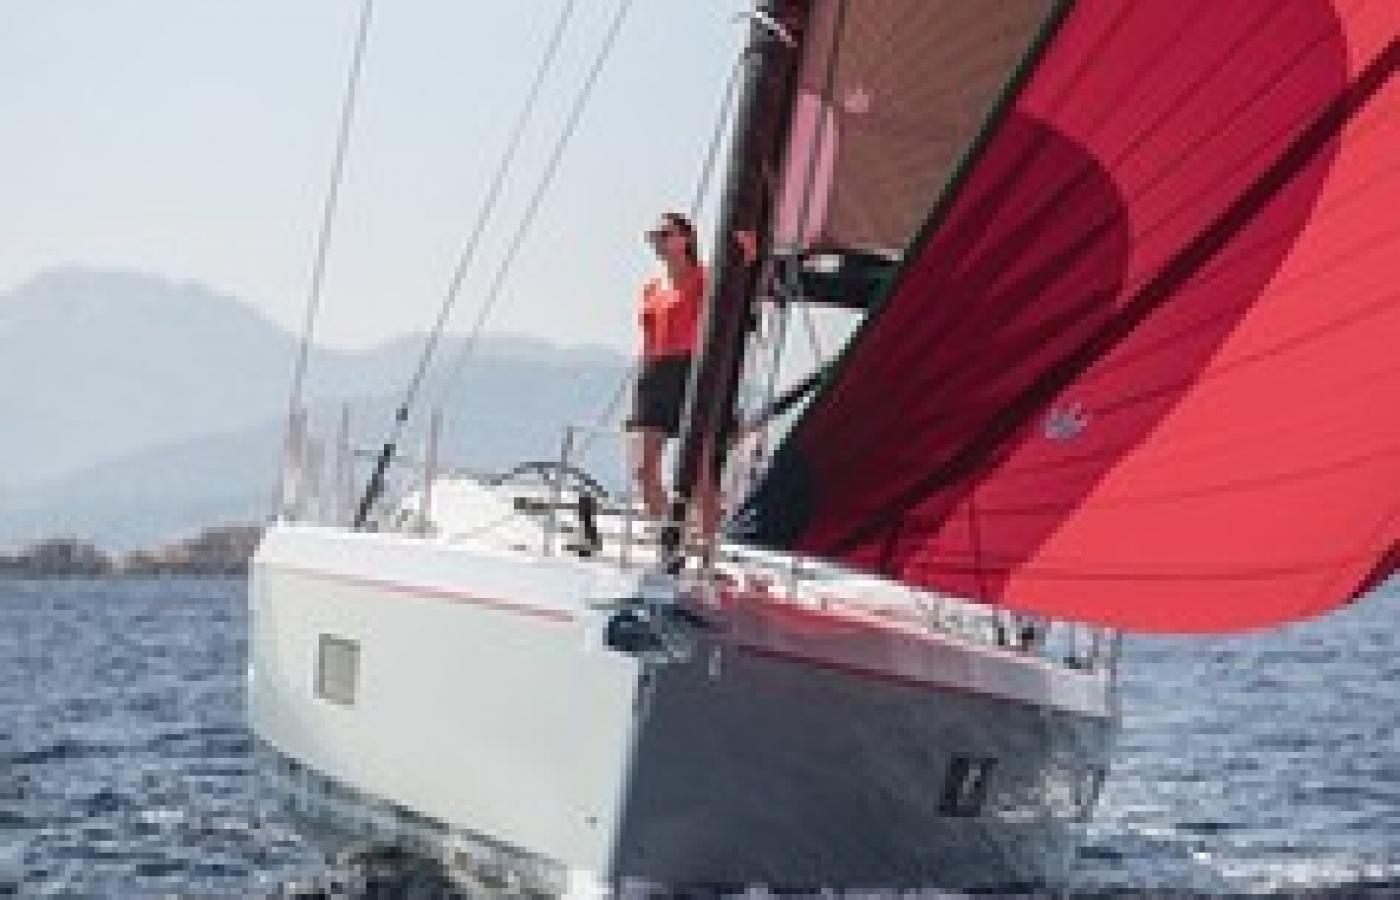 Beneteau Oceanis 51.1- Crewed Charter Yacht